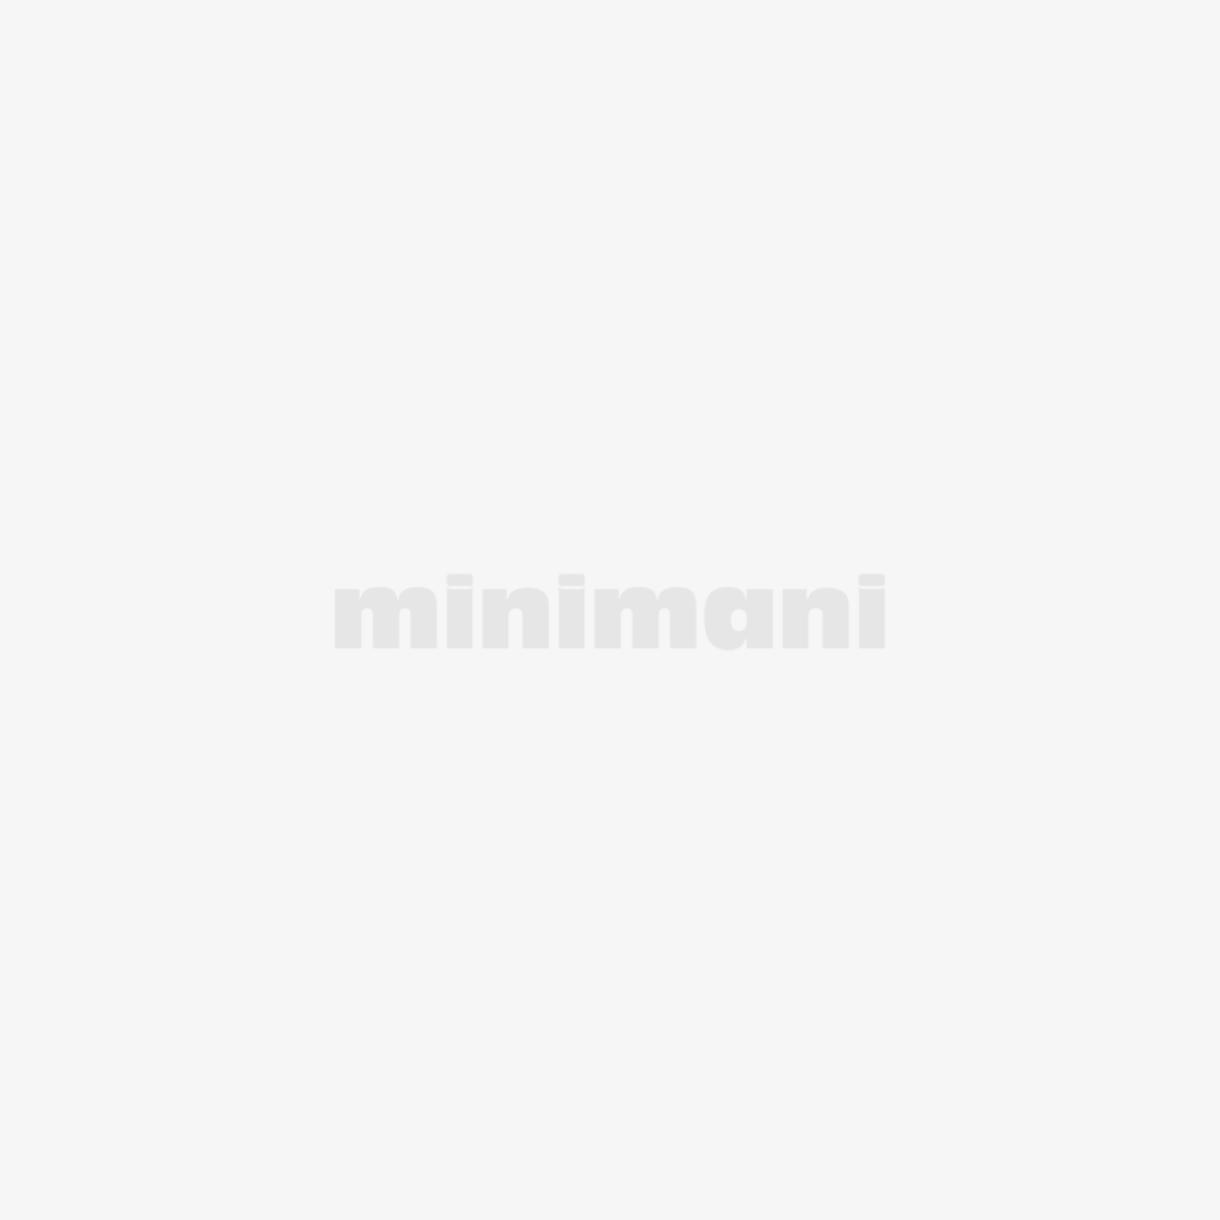 Vallila matto 160x230cm, Lily pinkki